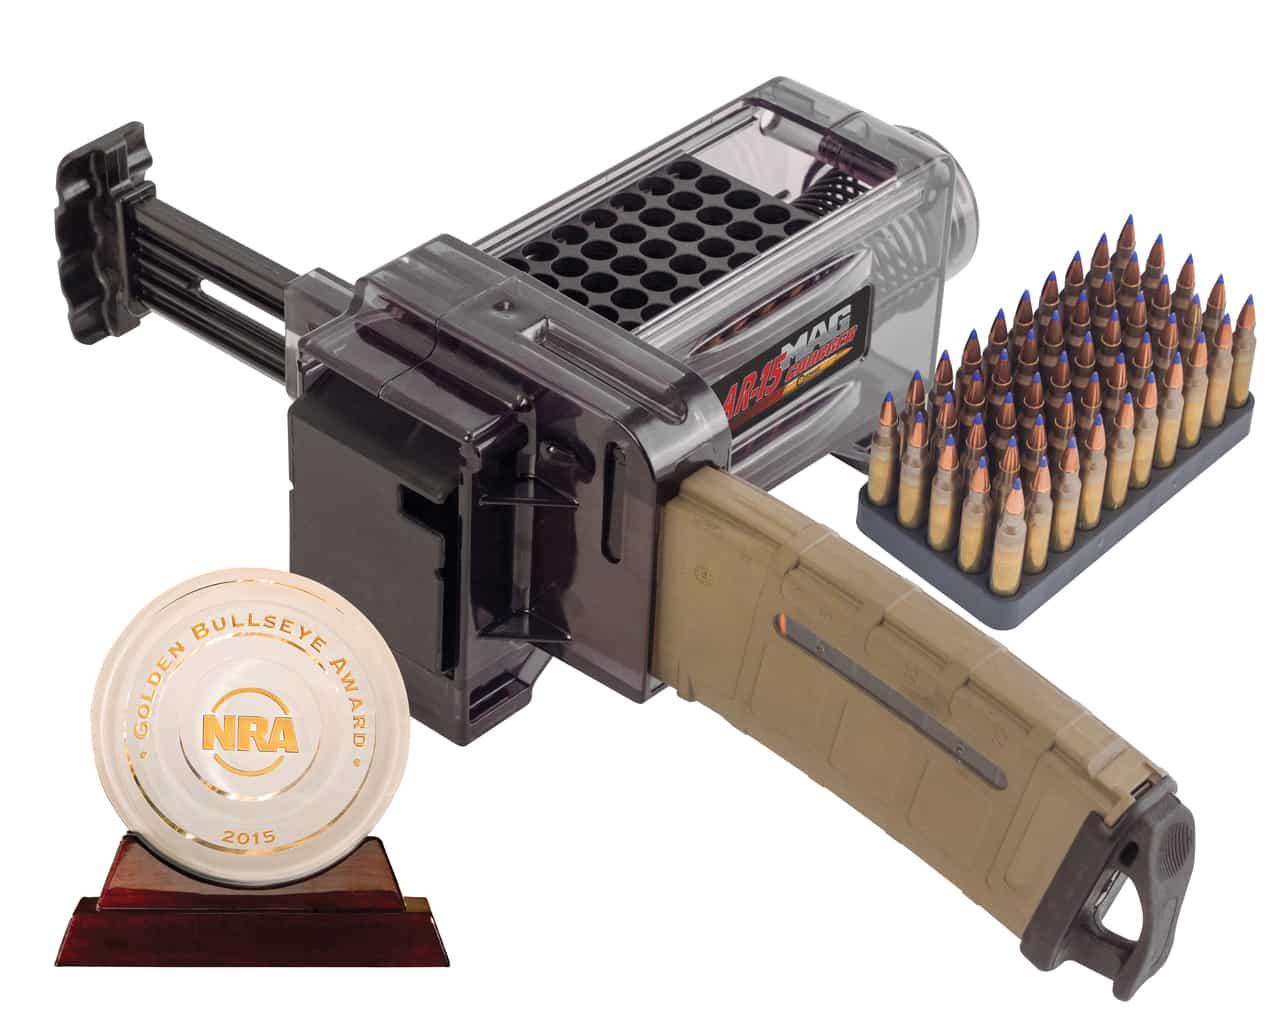 Ballistic Precision LR Target Camera System -220 volt - 397488 with Golden Bullseye Award